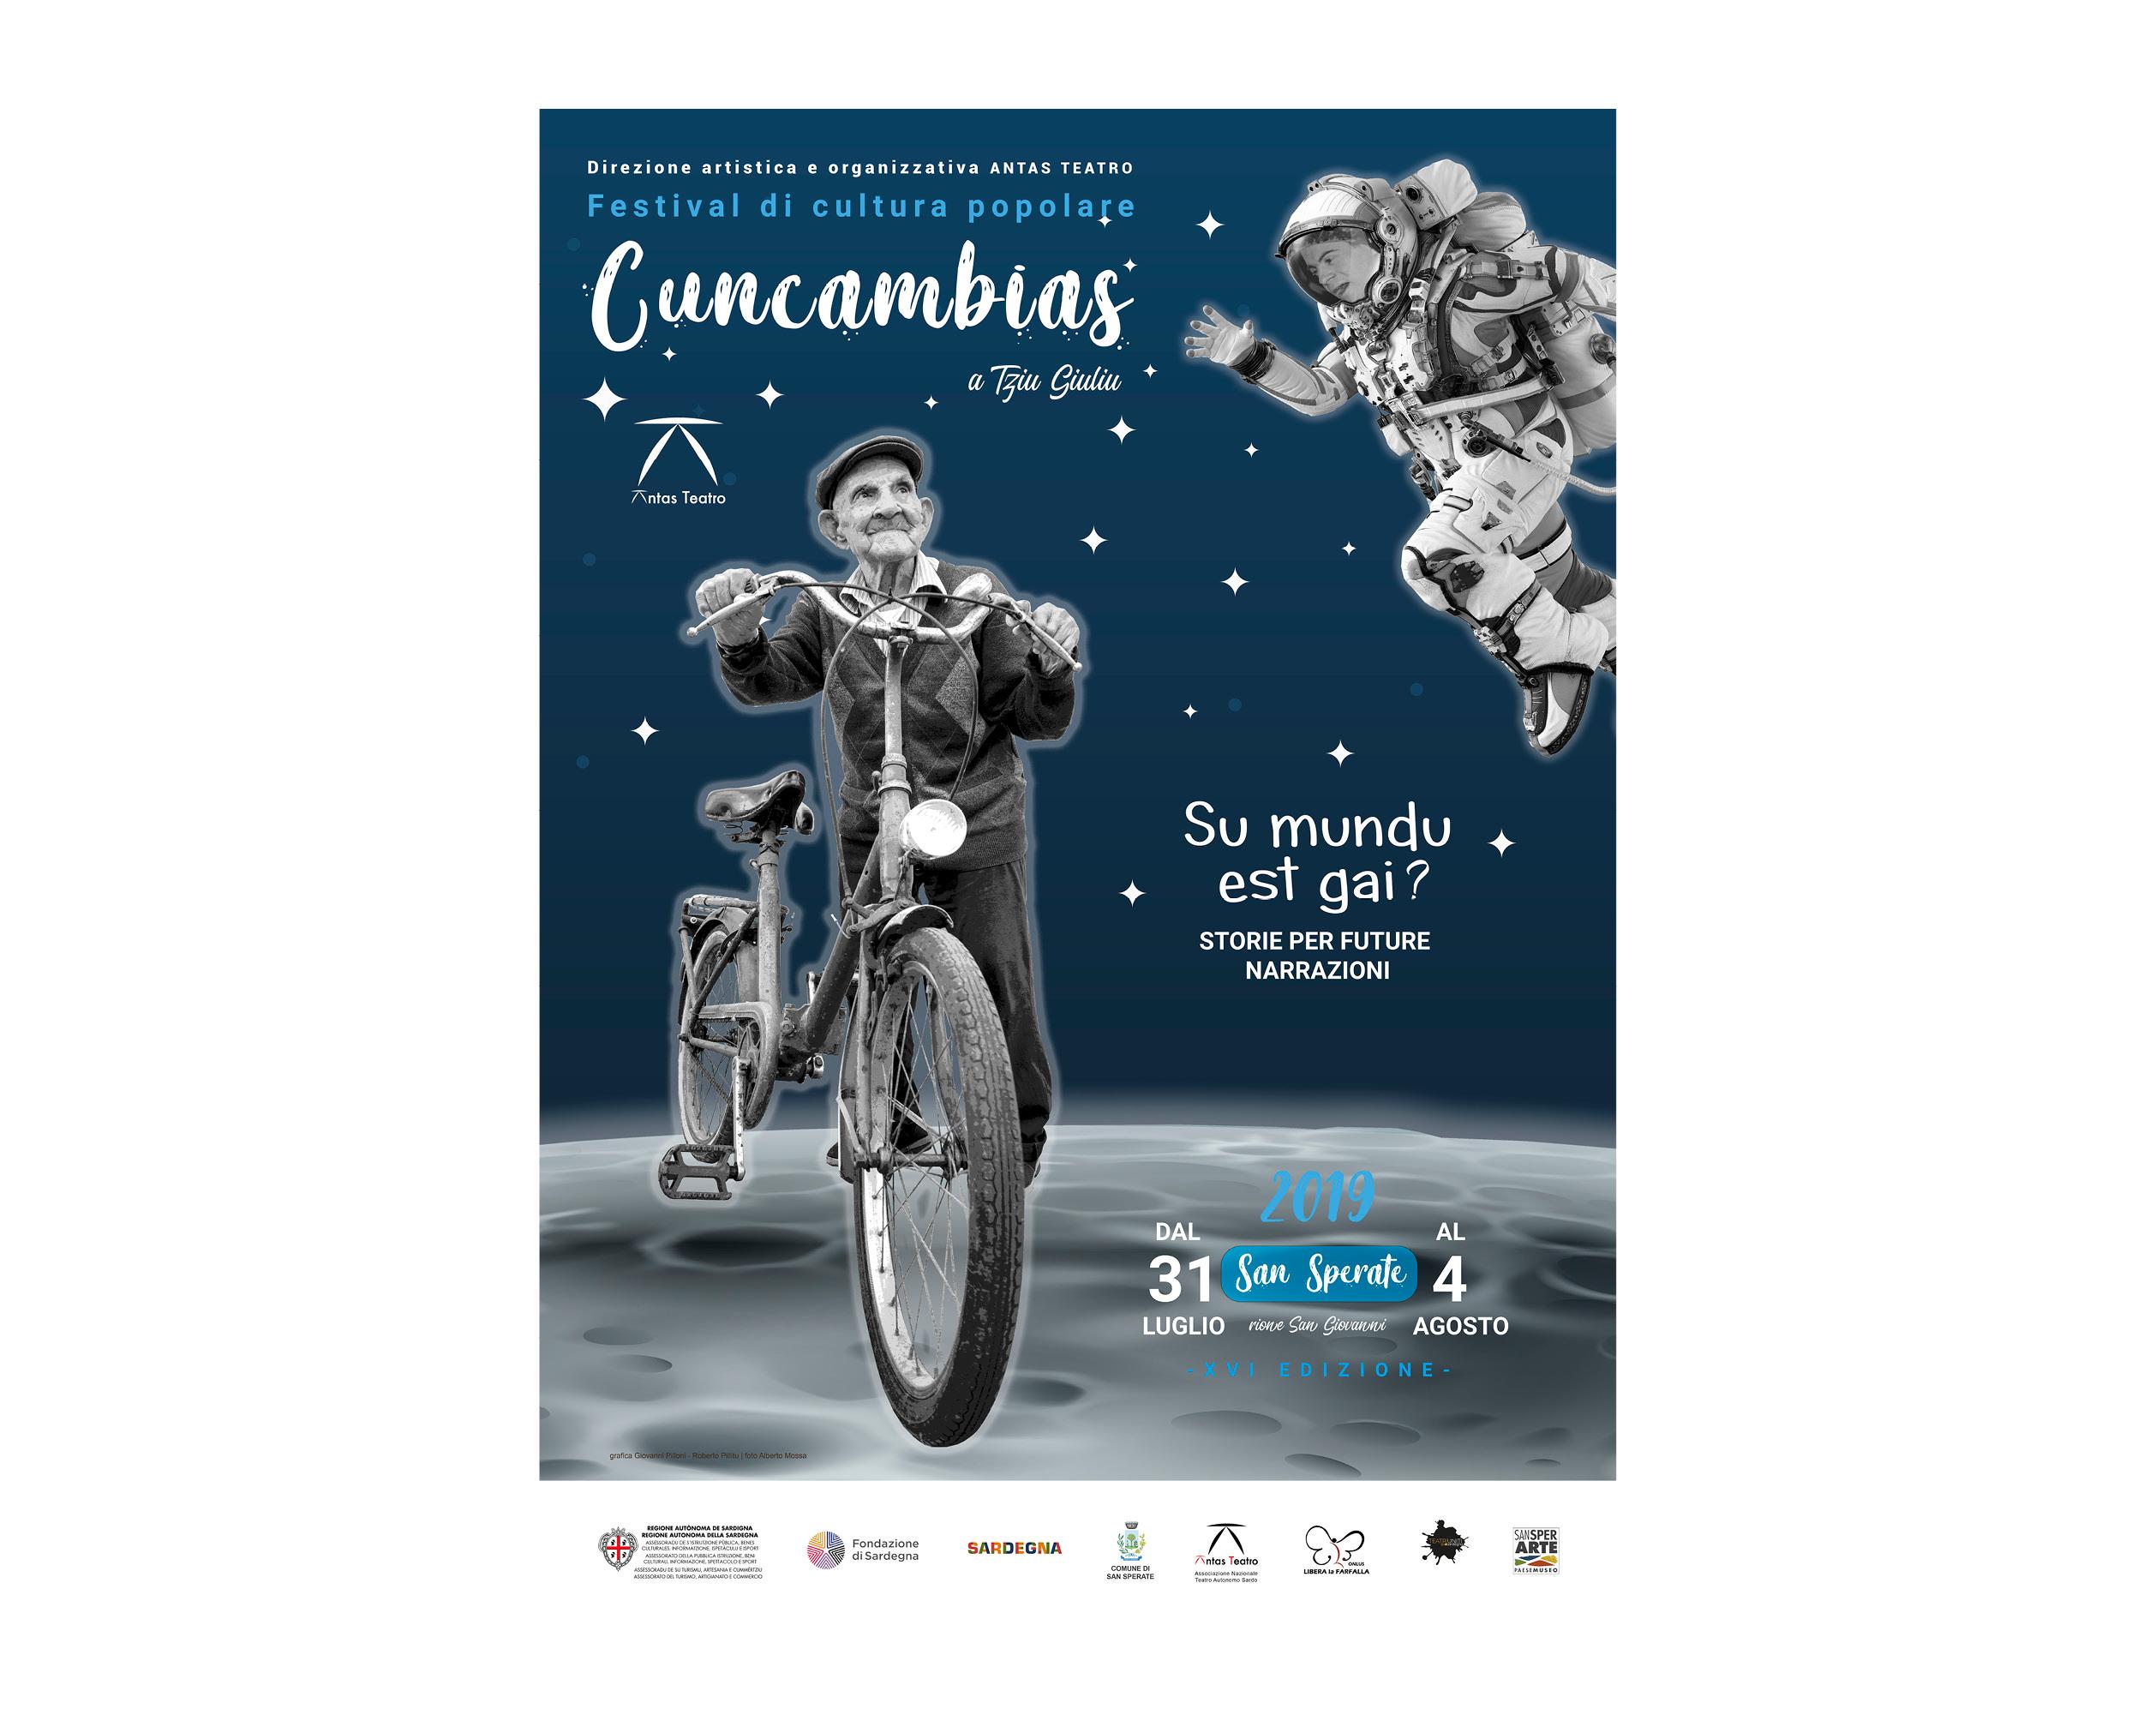 Cuncambias 2019